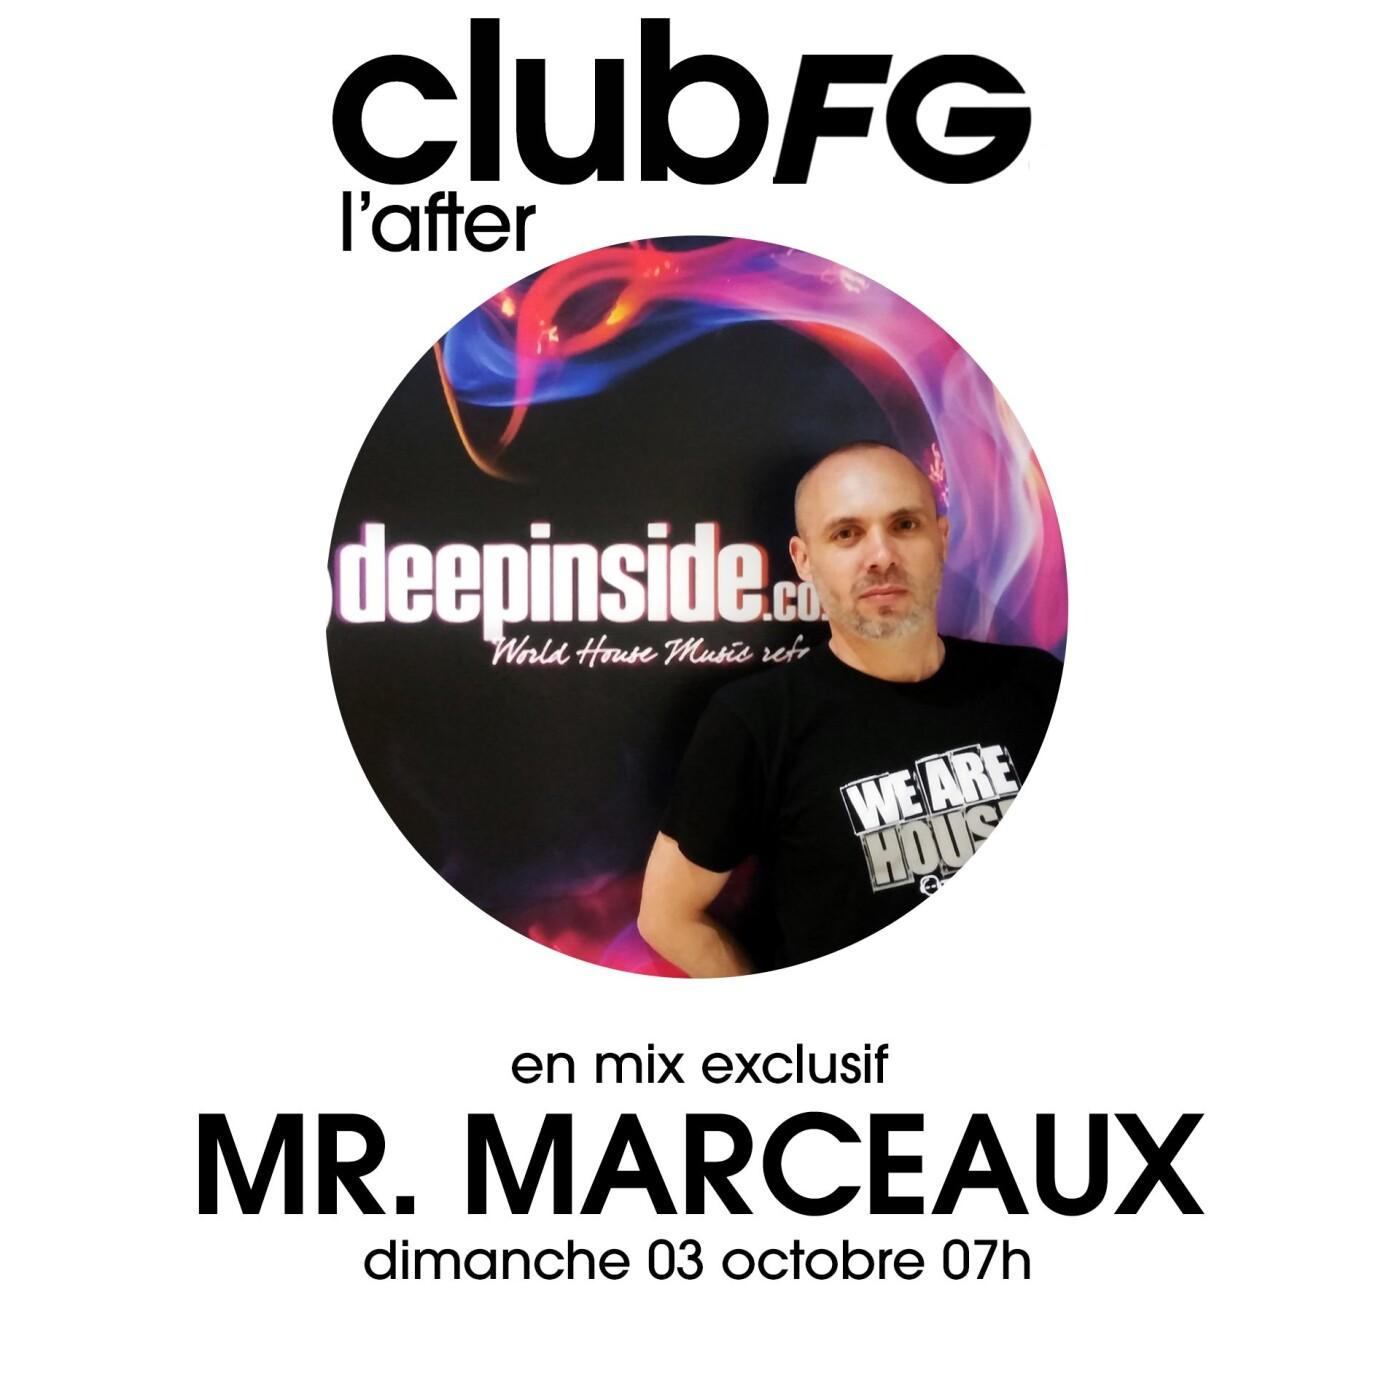 CLUB FG : MR MARCEAUX